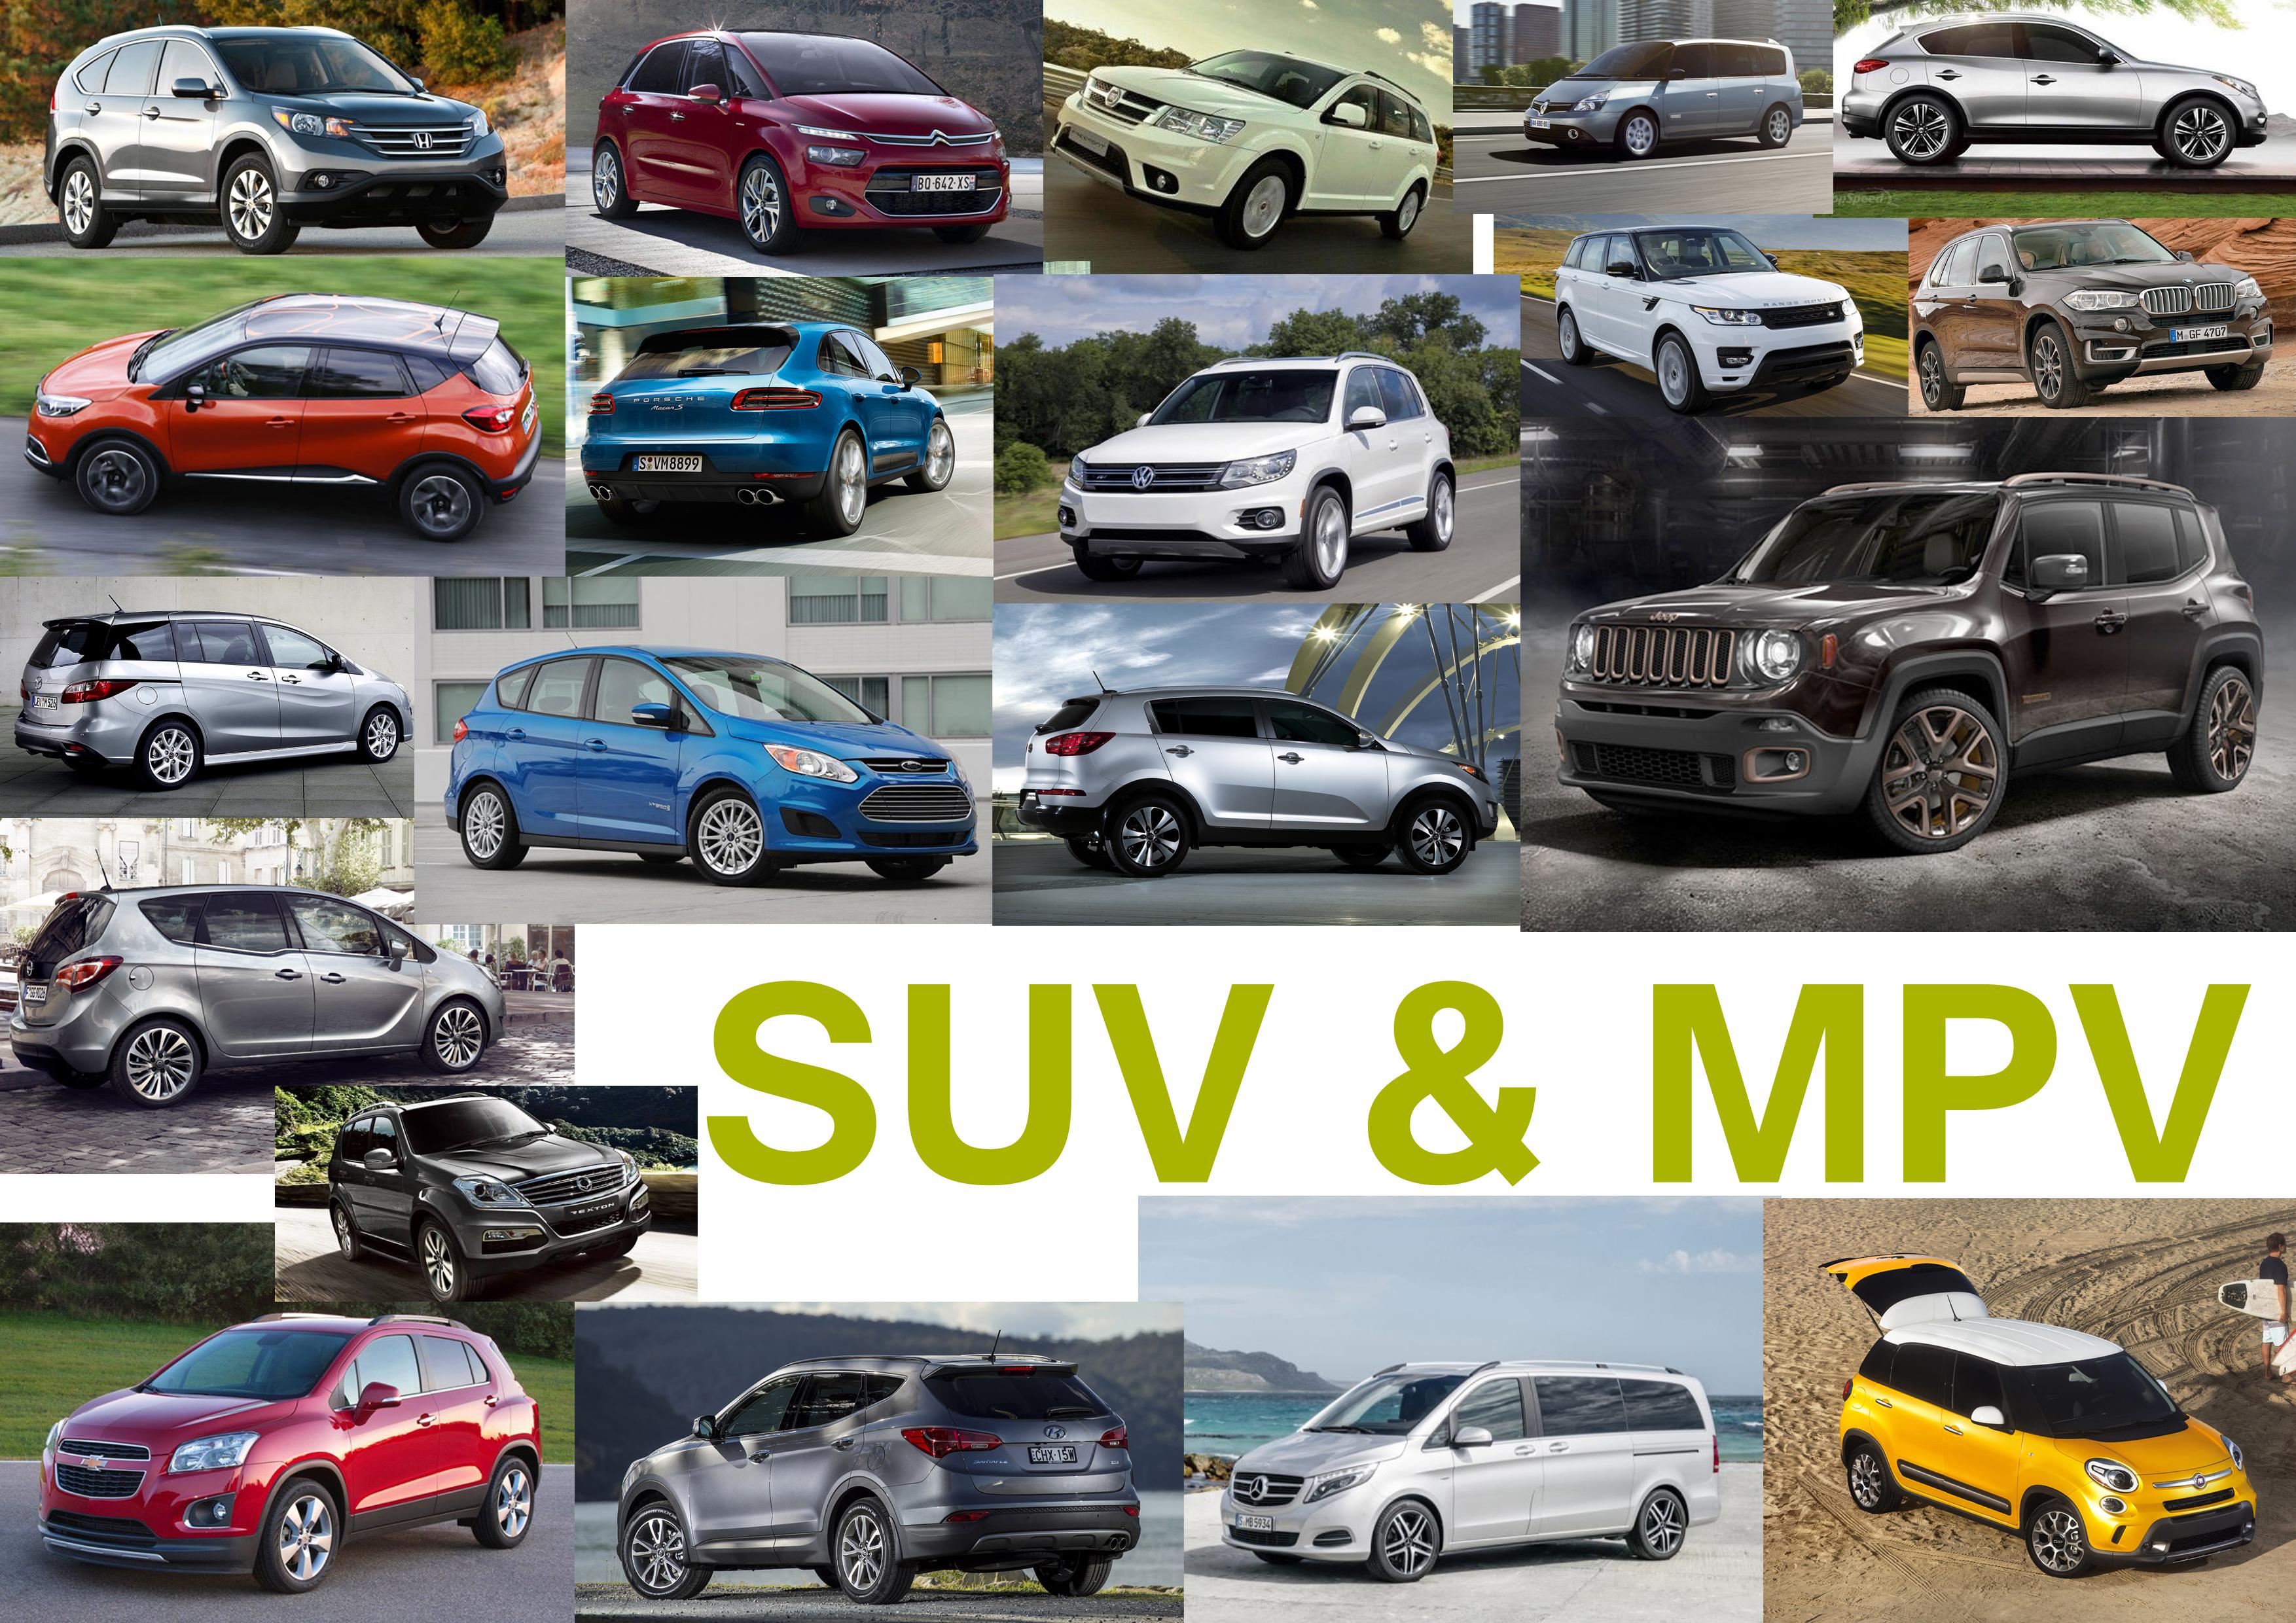 My segmentation | Fiat Group's World on fiat cars, fiat marea, fiat cinquecento, fiat multipla, fiat barchetta, fiat bravo, fiat panda, fiat seicento, fiat spider, fiat doblo, fiat ritmo, fiat linea, fiat x1/9, fiat coupe, fiat 500 abarth, fiat 500l, fiat stilo, fiat 500 turbo,